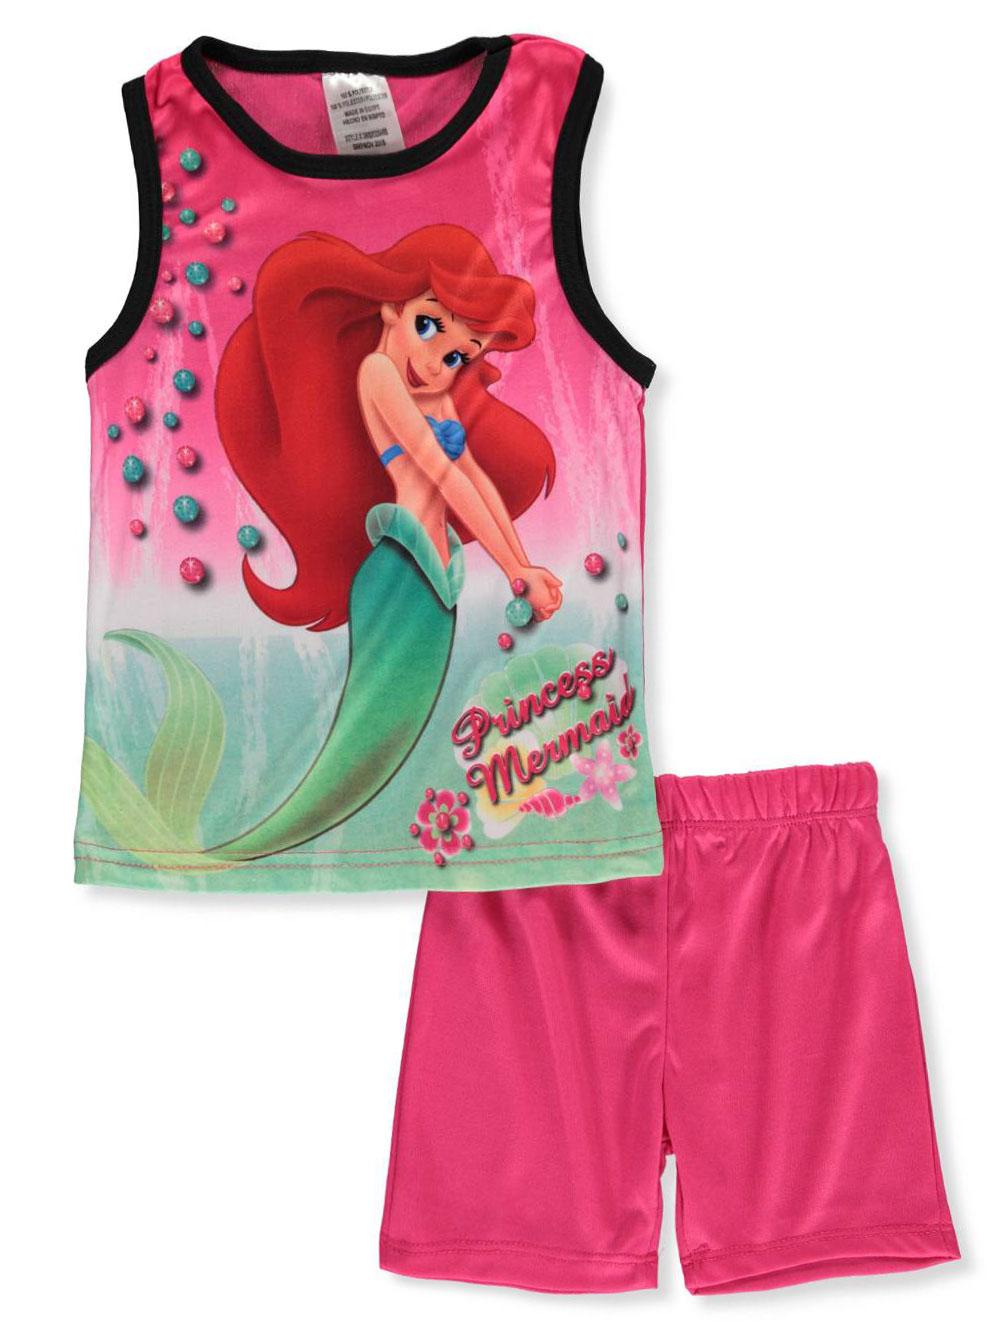 b828587fbcf83 Disney The Little Mermaid Girls' 2-Piece Shorts Set Outfit